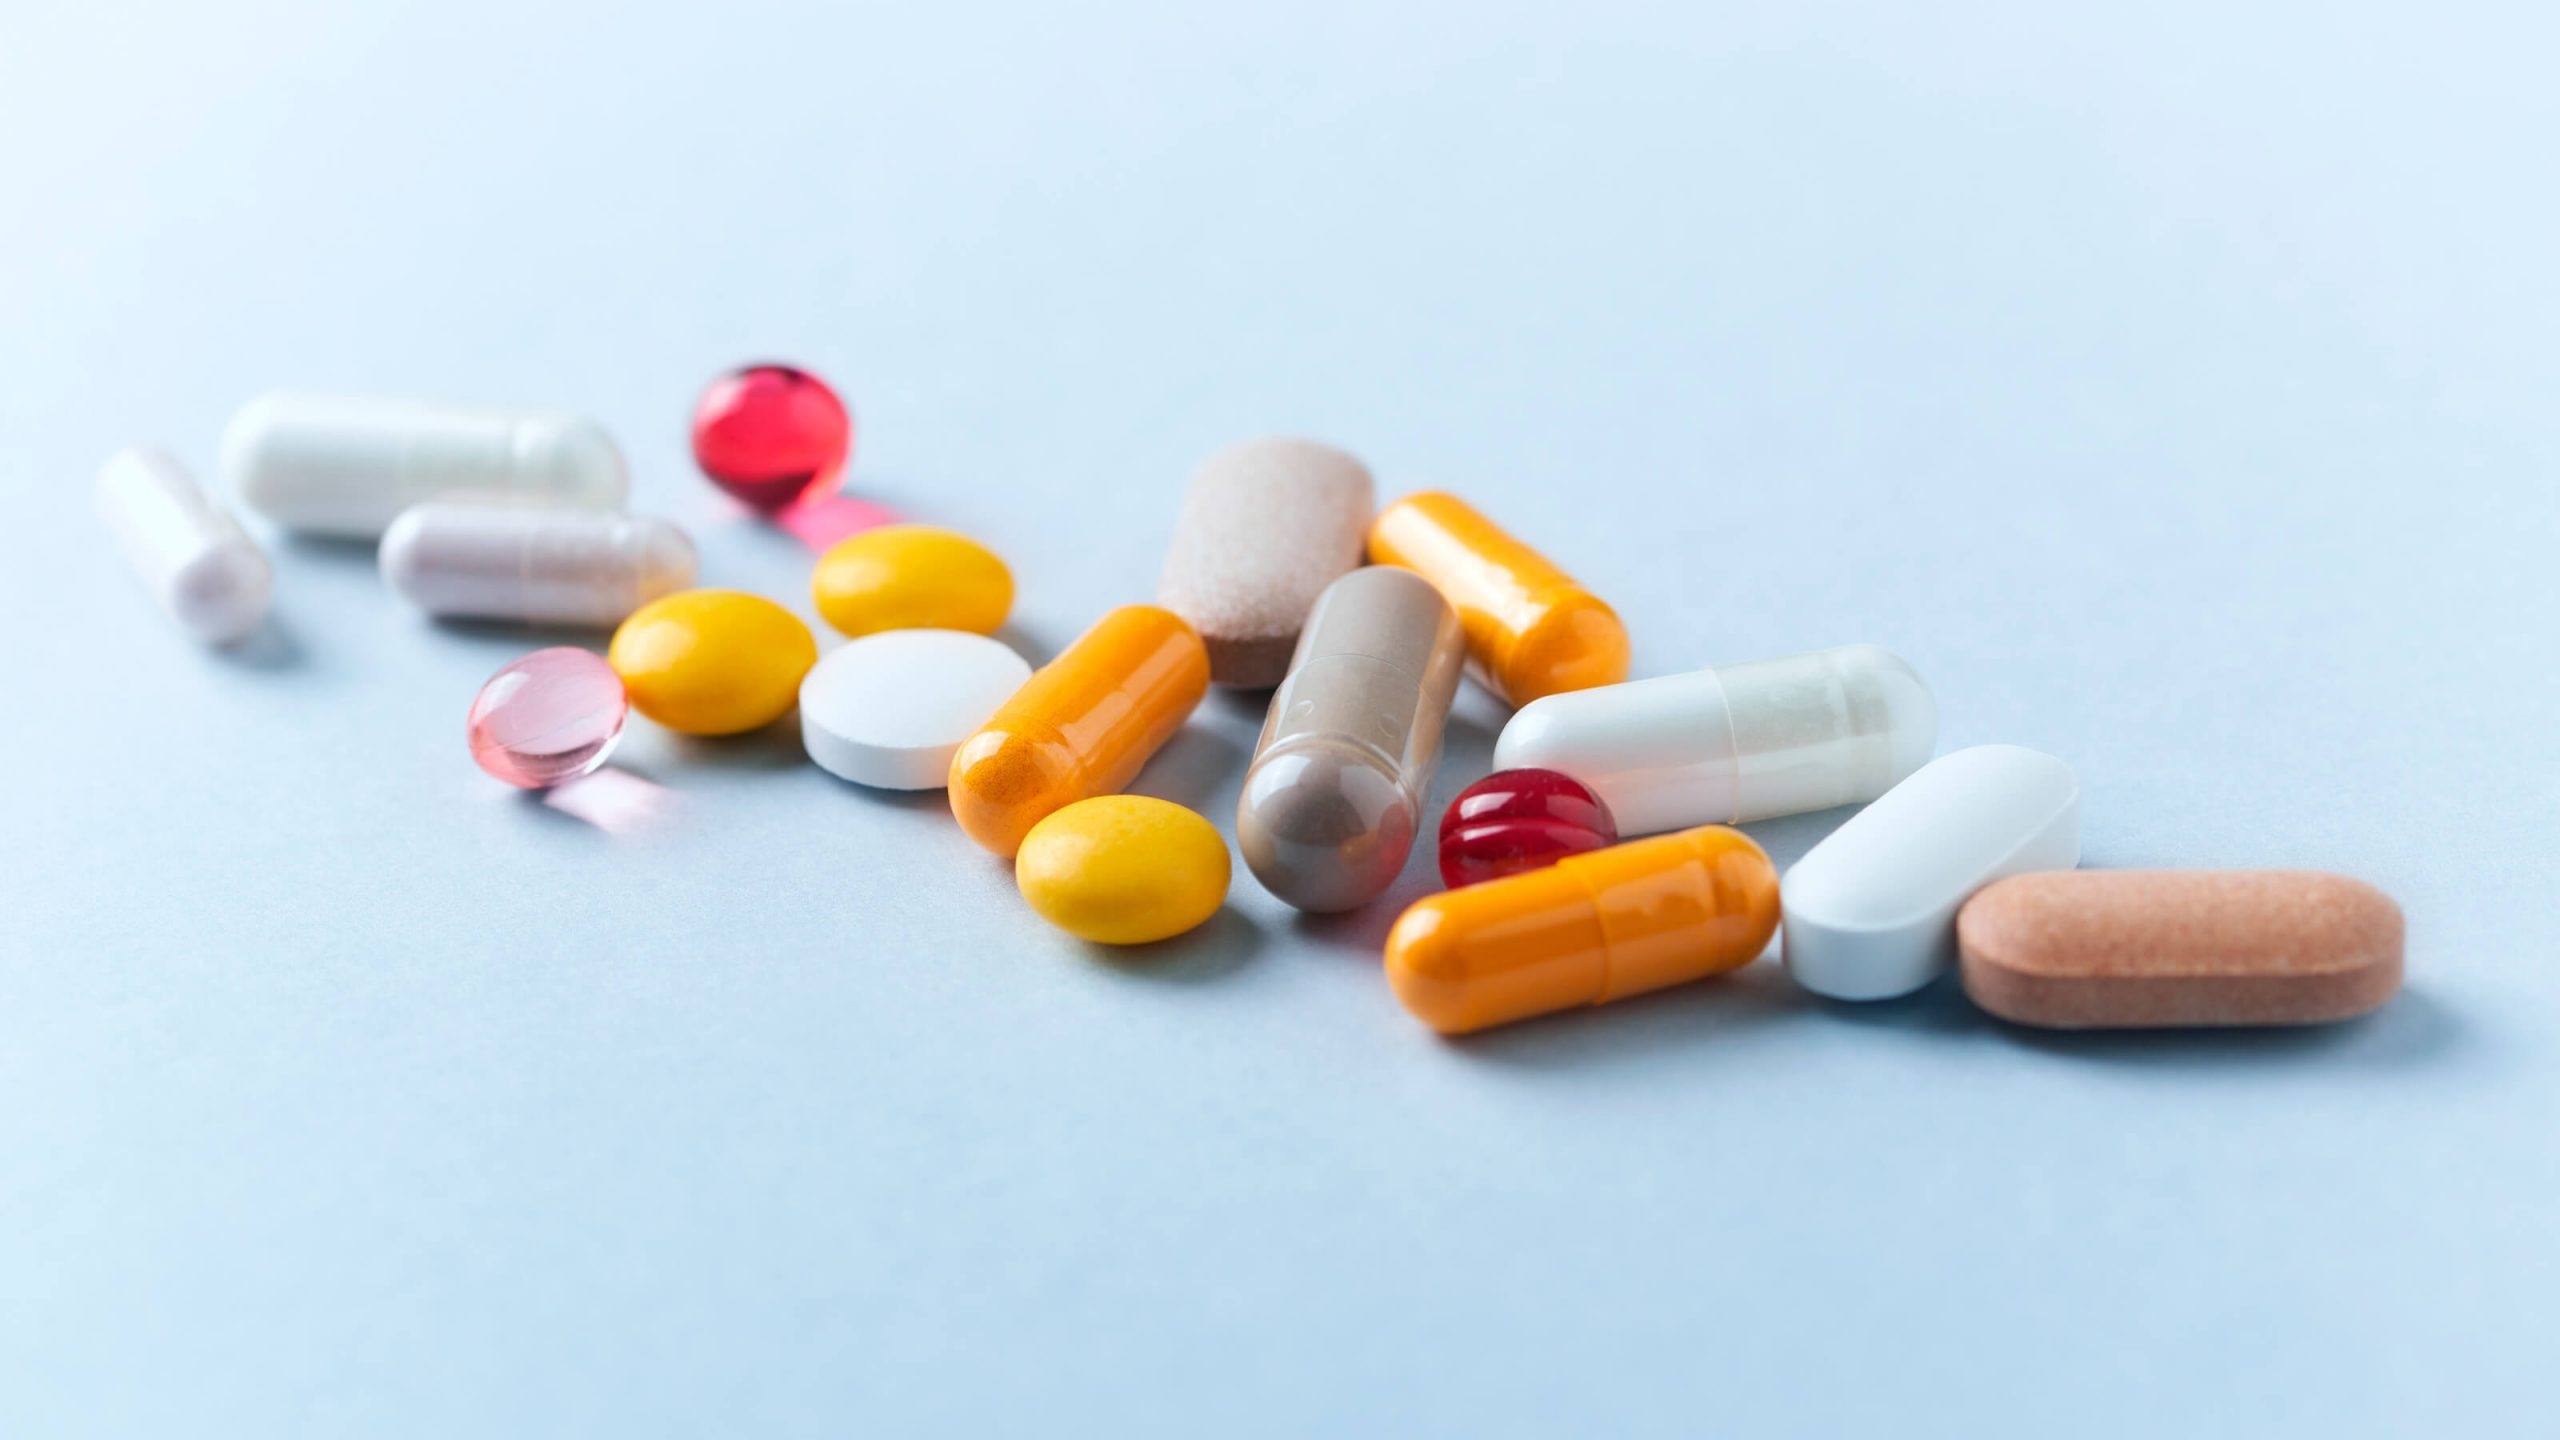 rupture-de-médicament-nécessité-de-stock